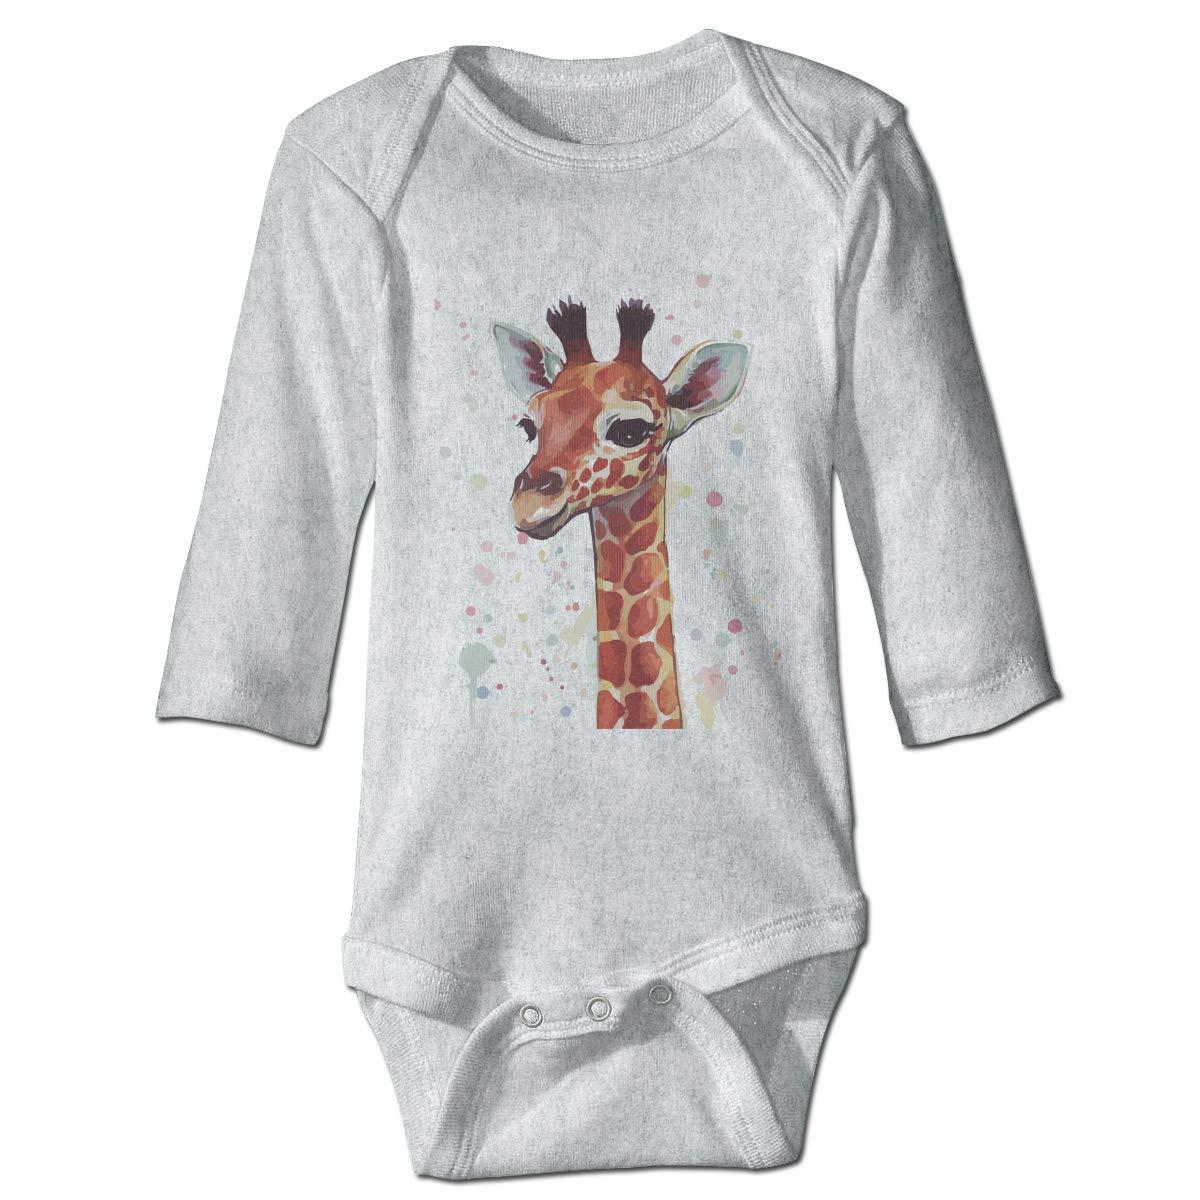 Dfenere Cute Giraffe Hip Hop Newborn Baby Long Sleeve Bodysuit Romper Infant Summer Clothing